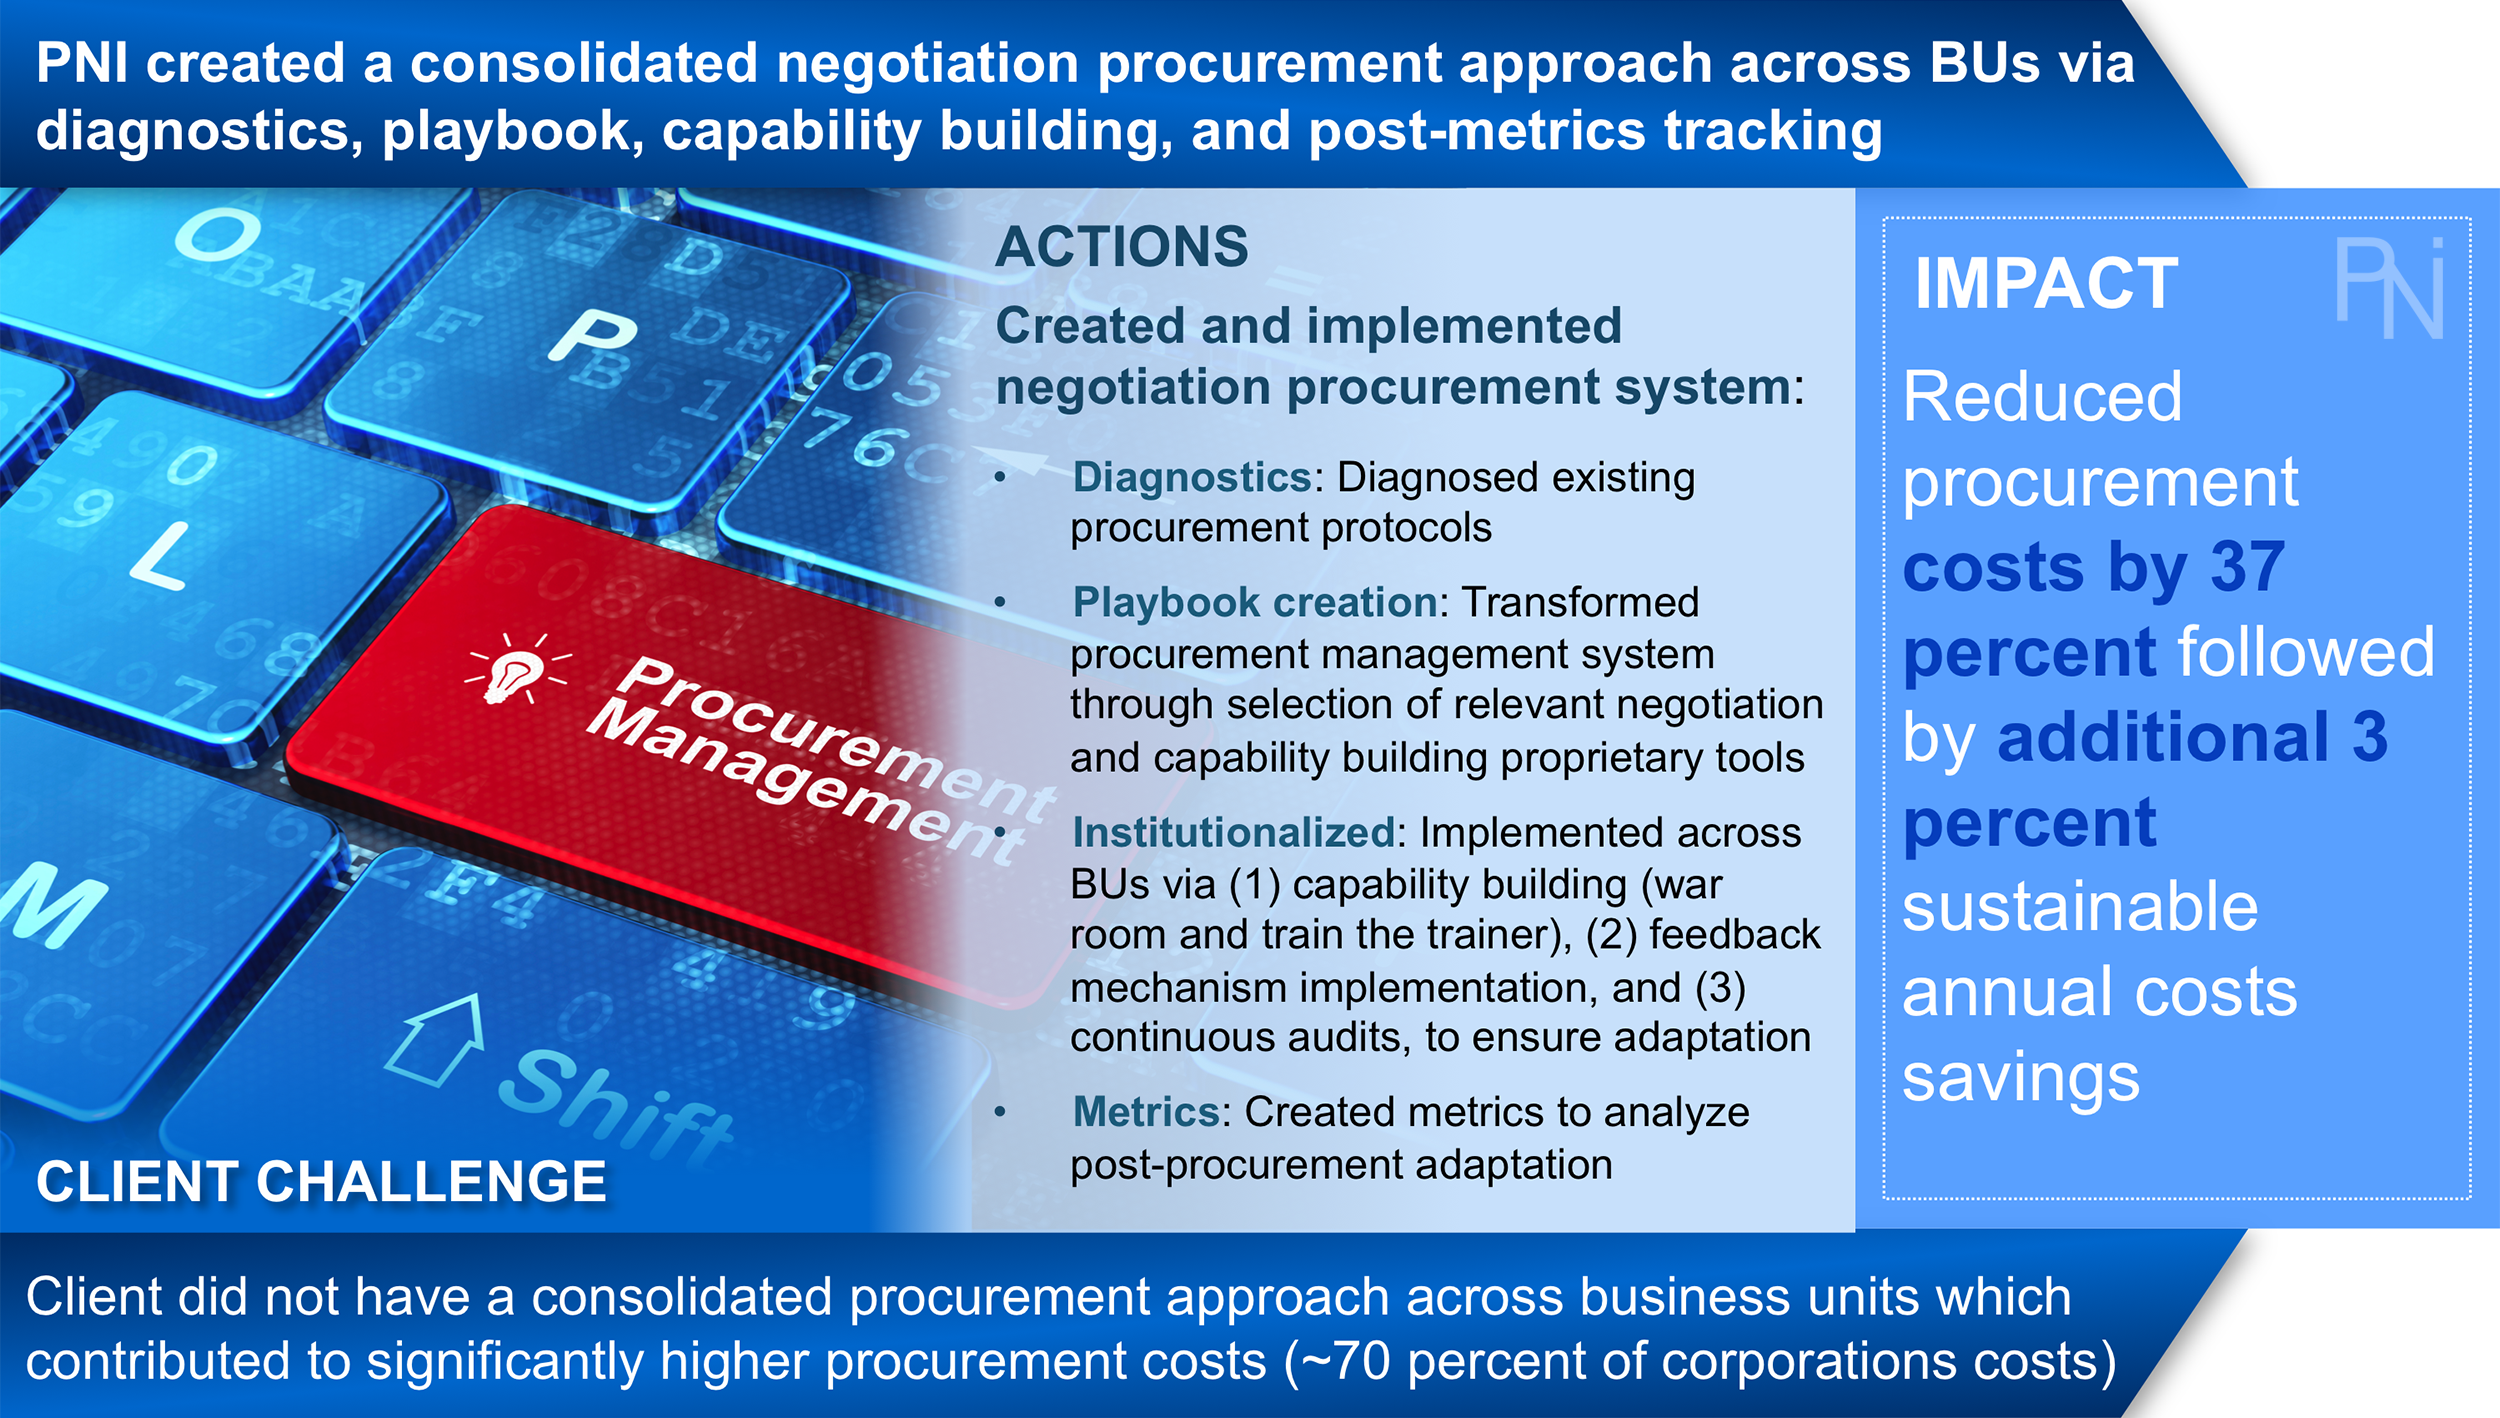 Procurement Results 2 - PNI.png